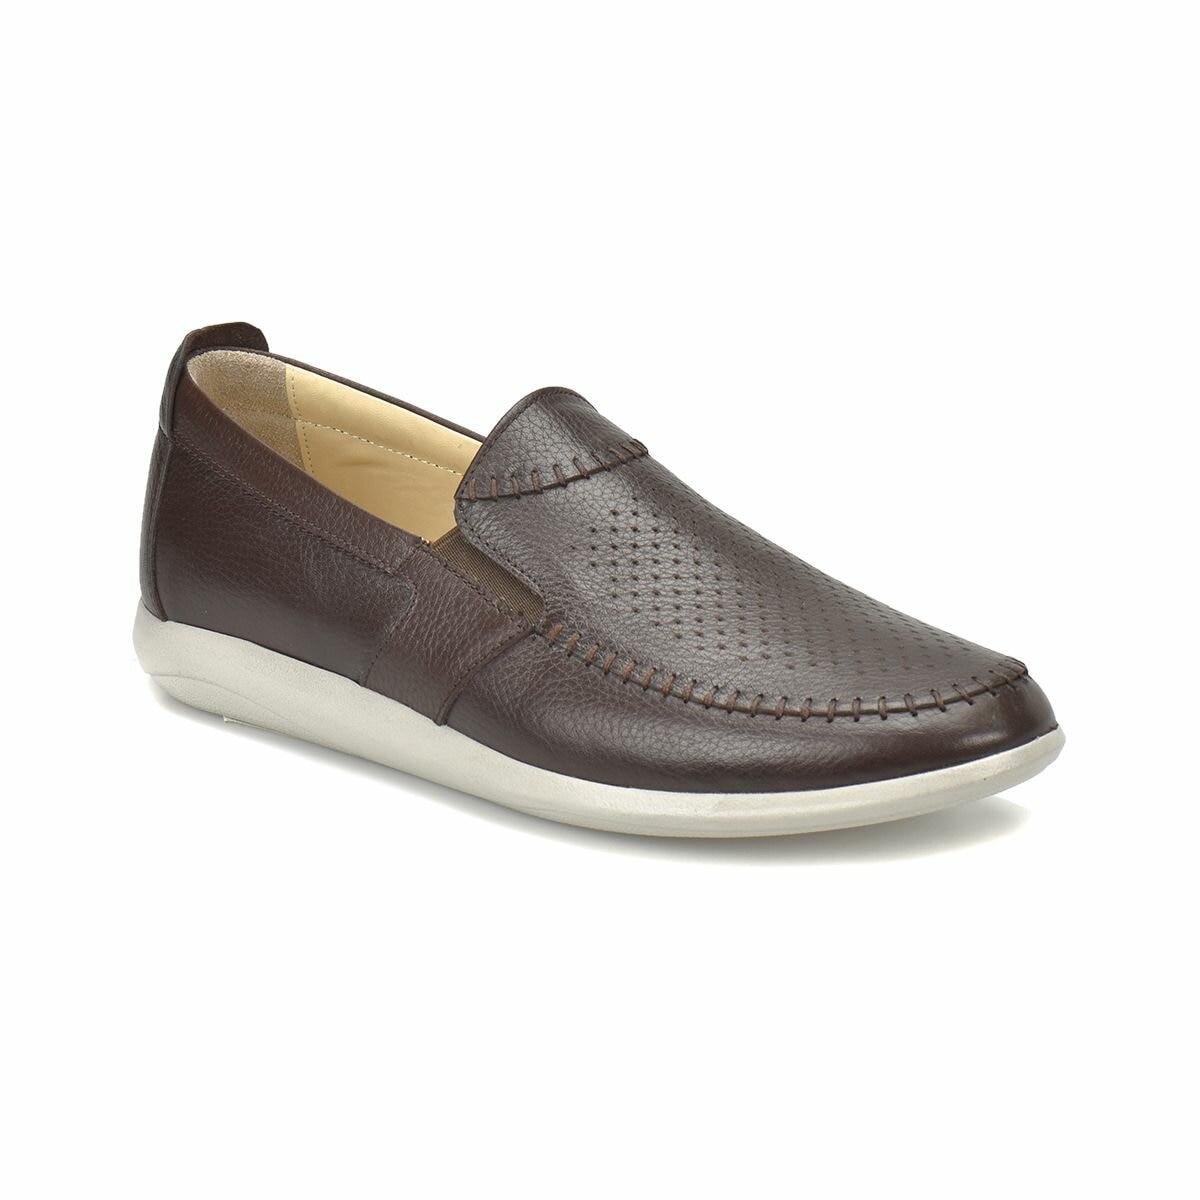 FLO 800 M 6674 Brown Men 'S Modern Shoes Flogart